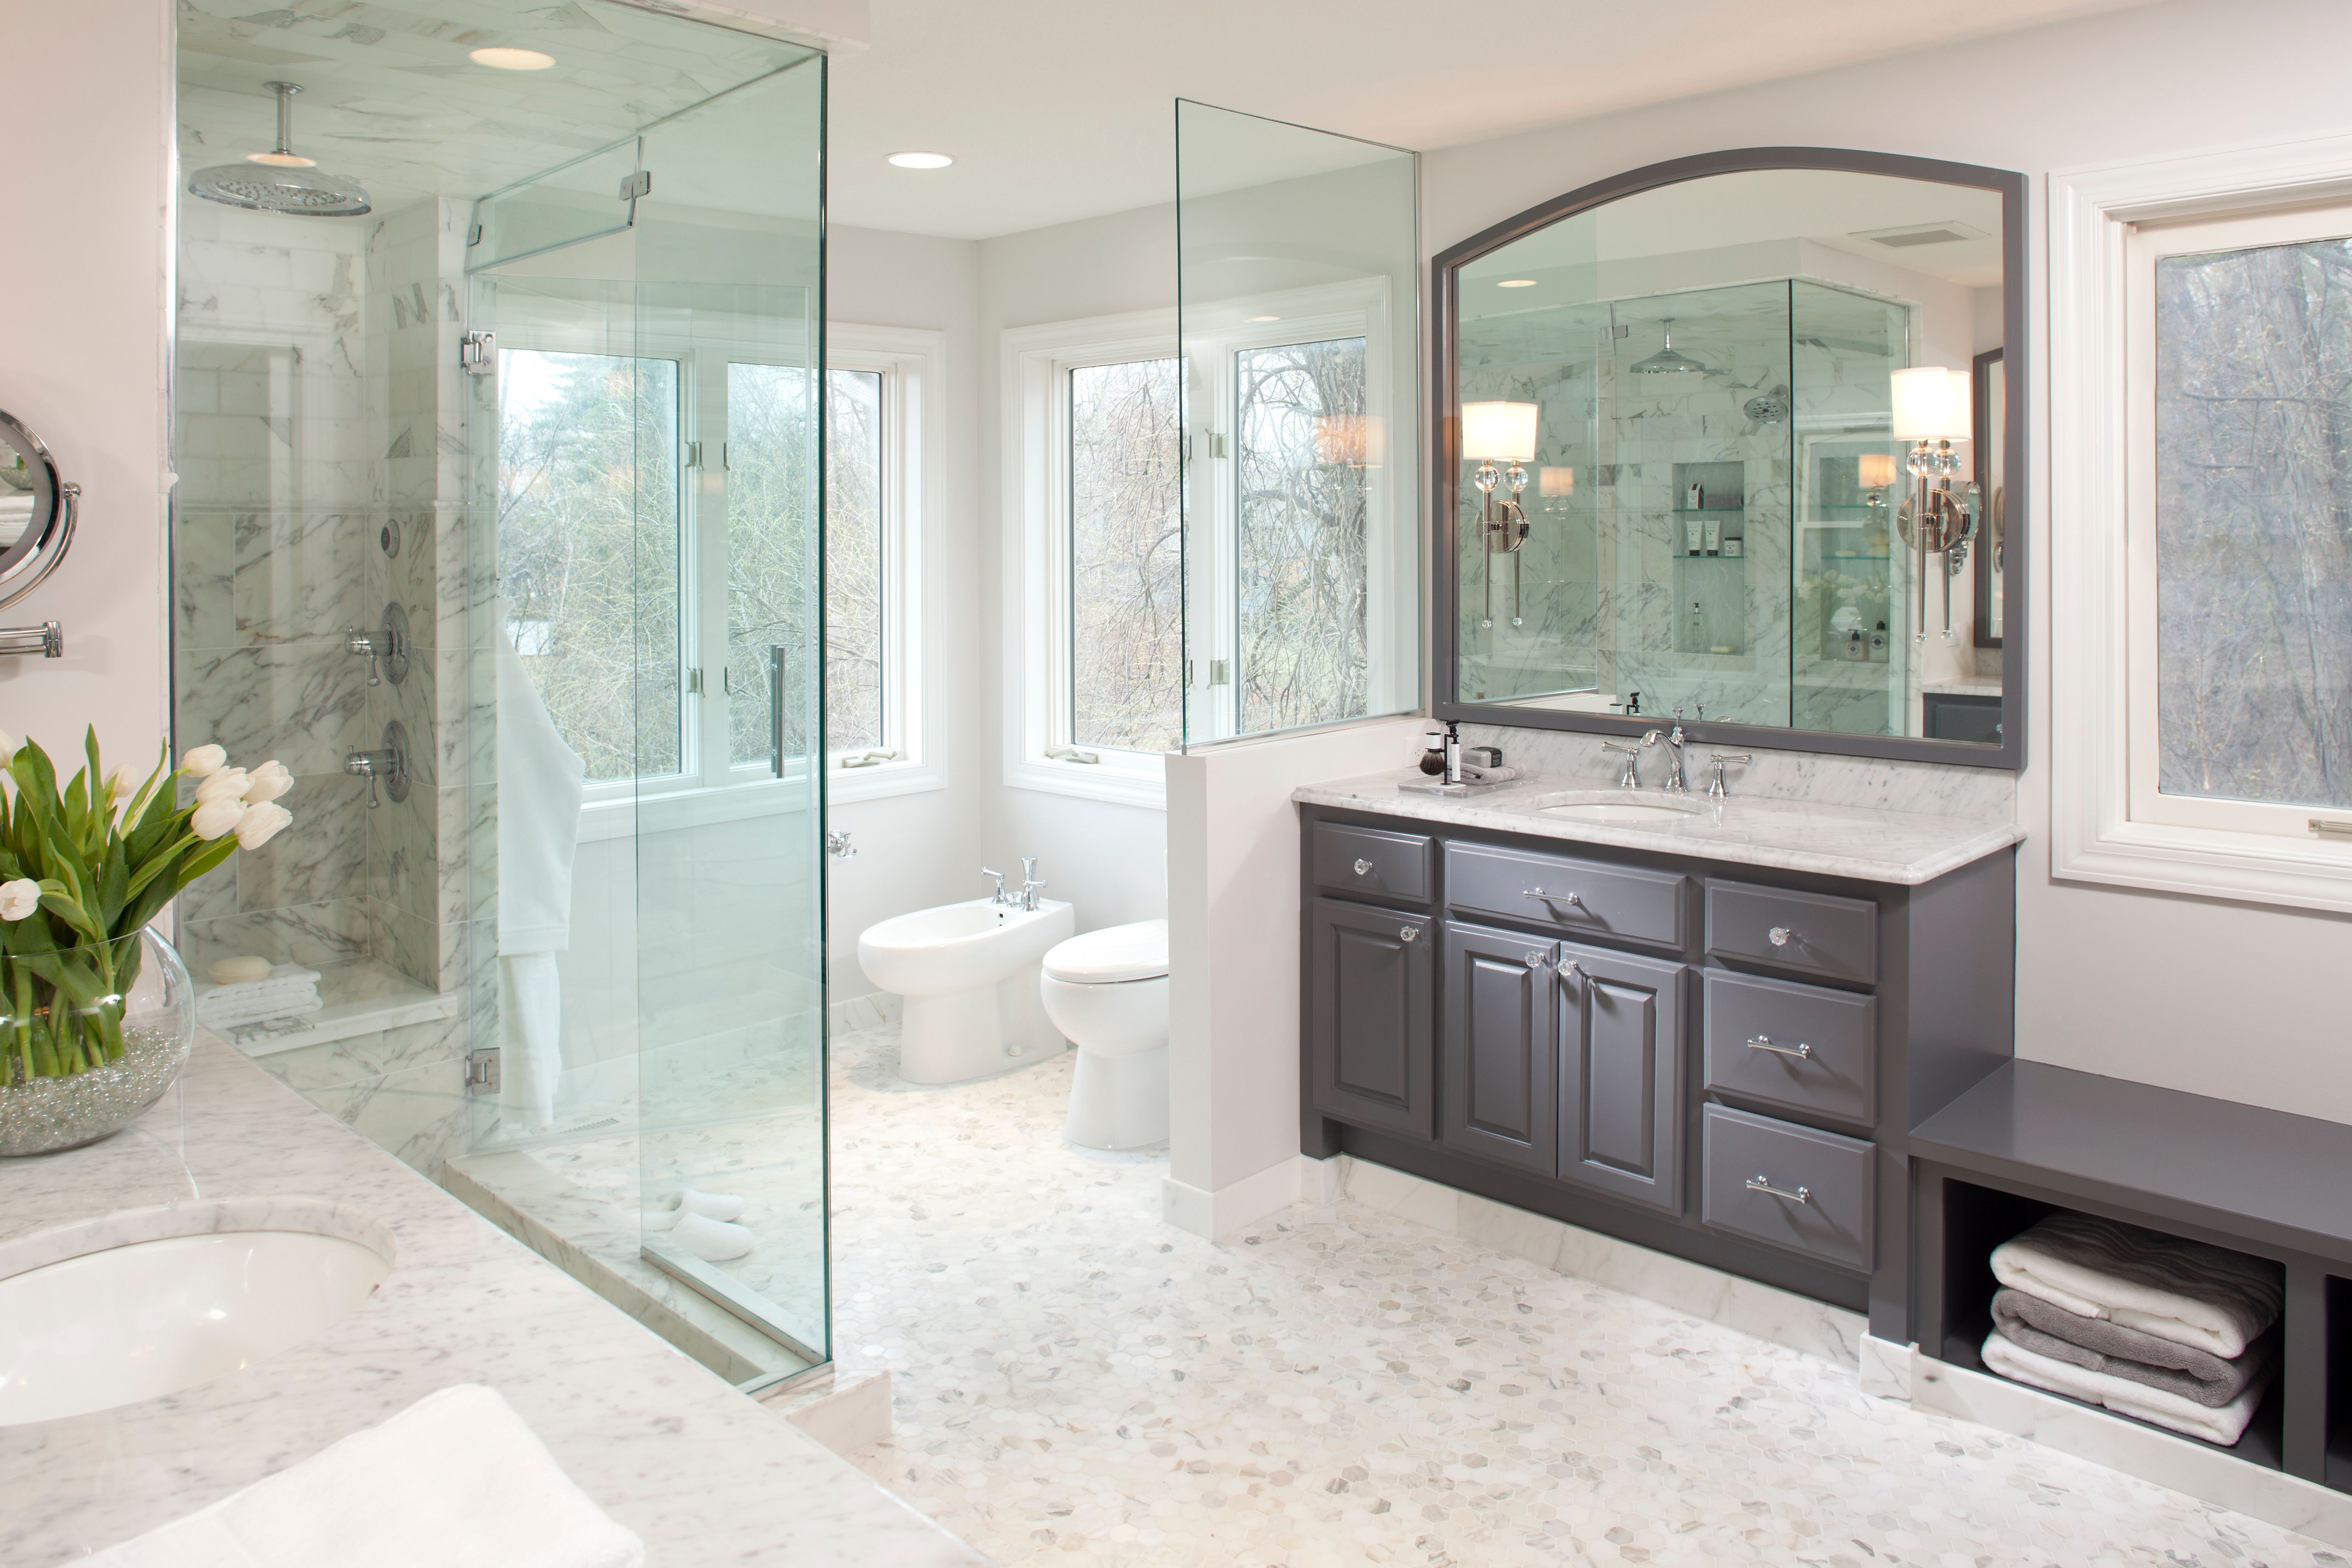 Bathroom Renovations Hgtv Makeovers  Luxurybathroombathroom Awesome Simple Bathroom Remodels 2018